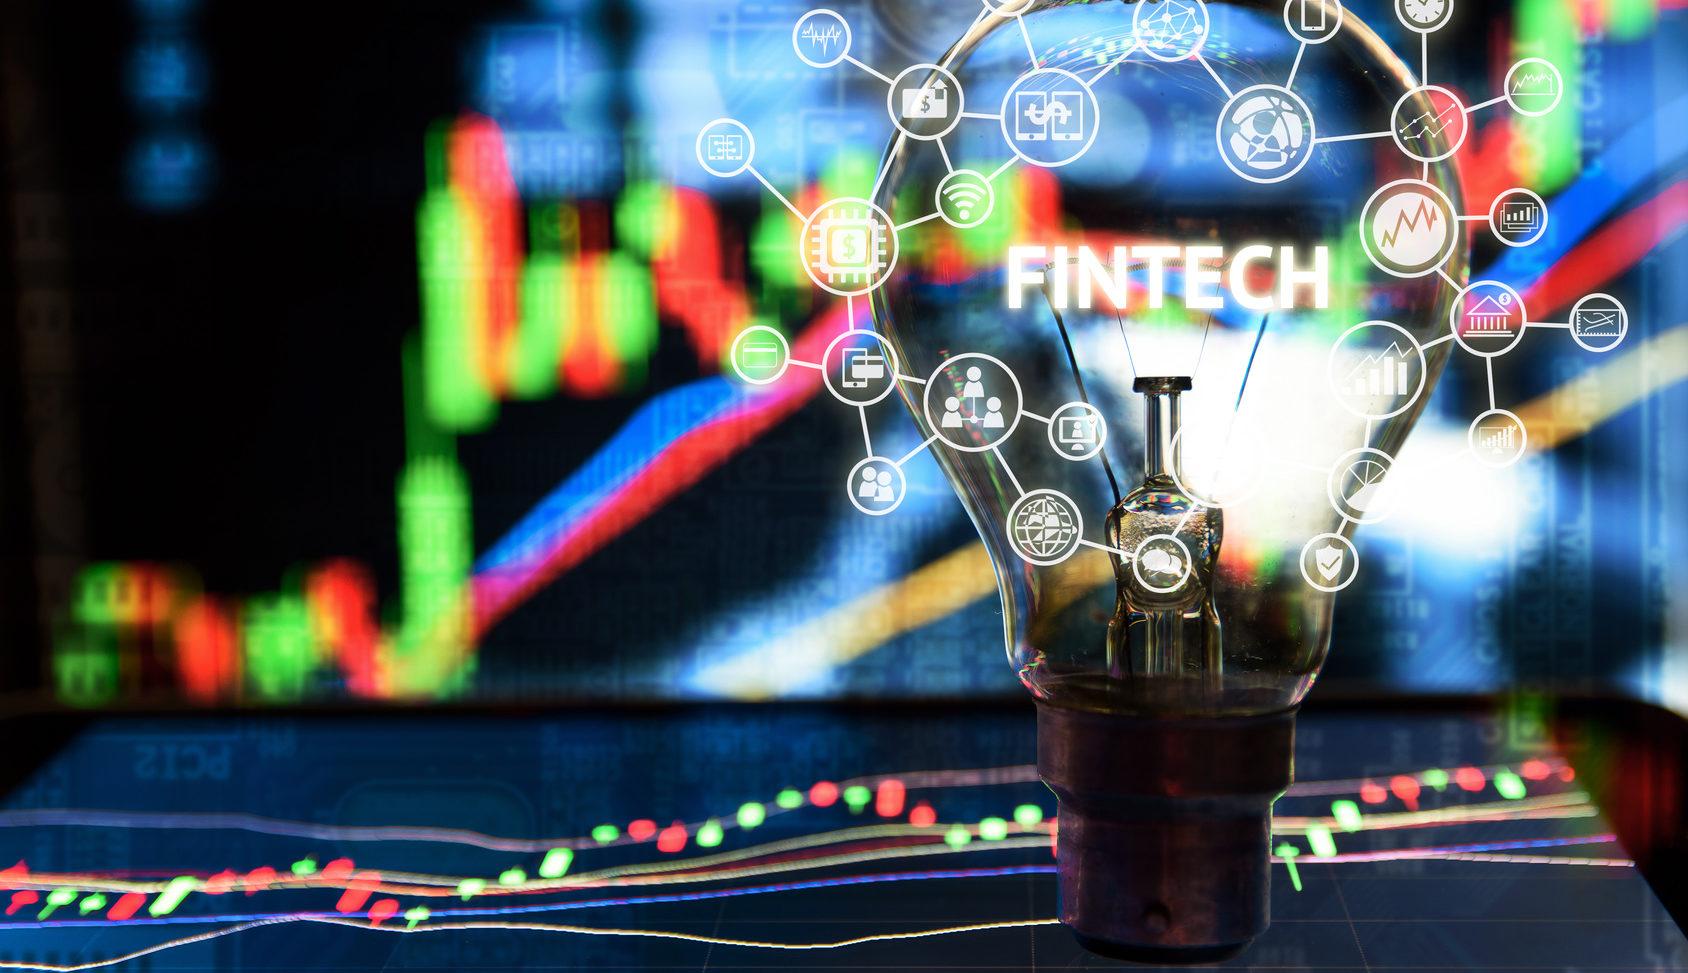 The Fintechs: towards a revolution of finance?